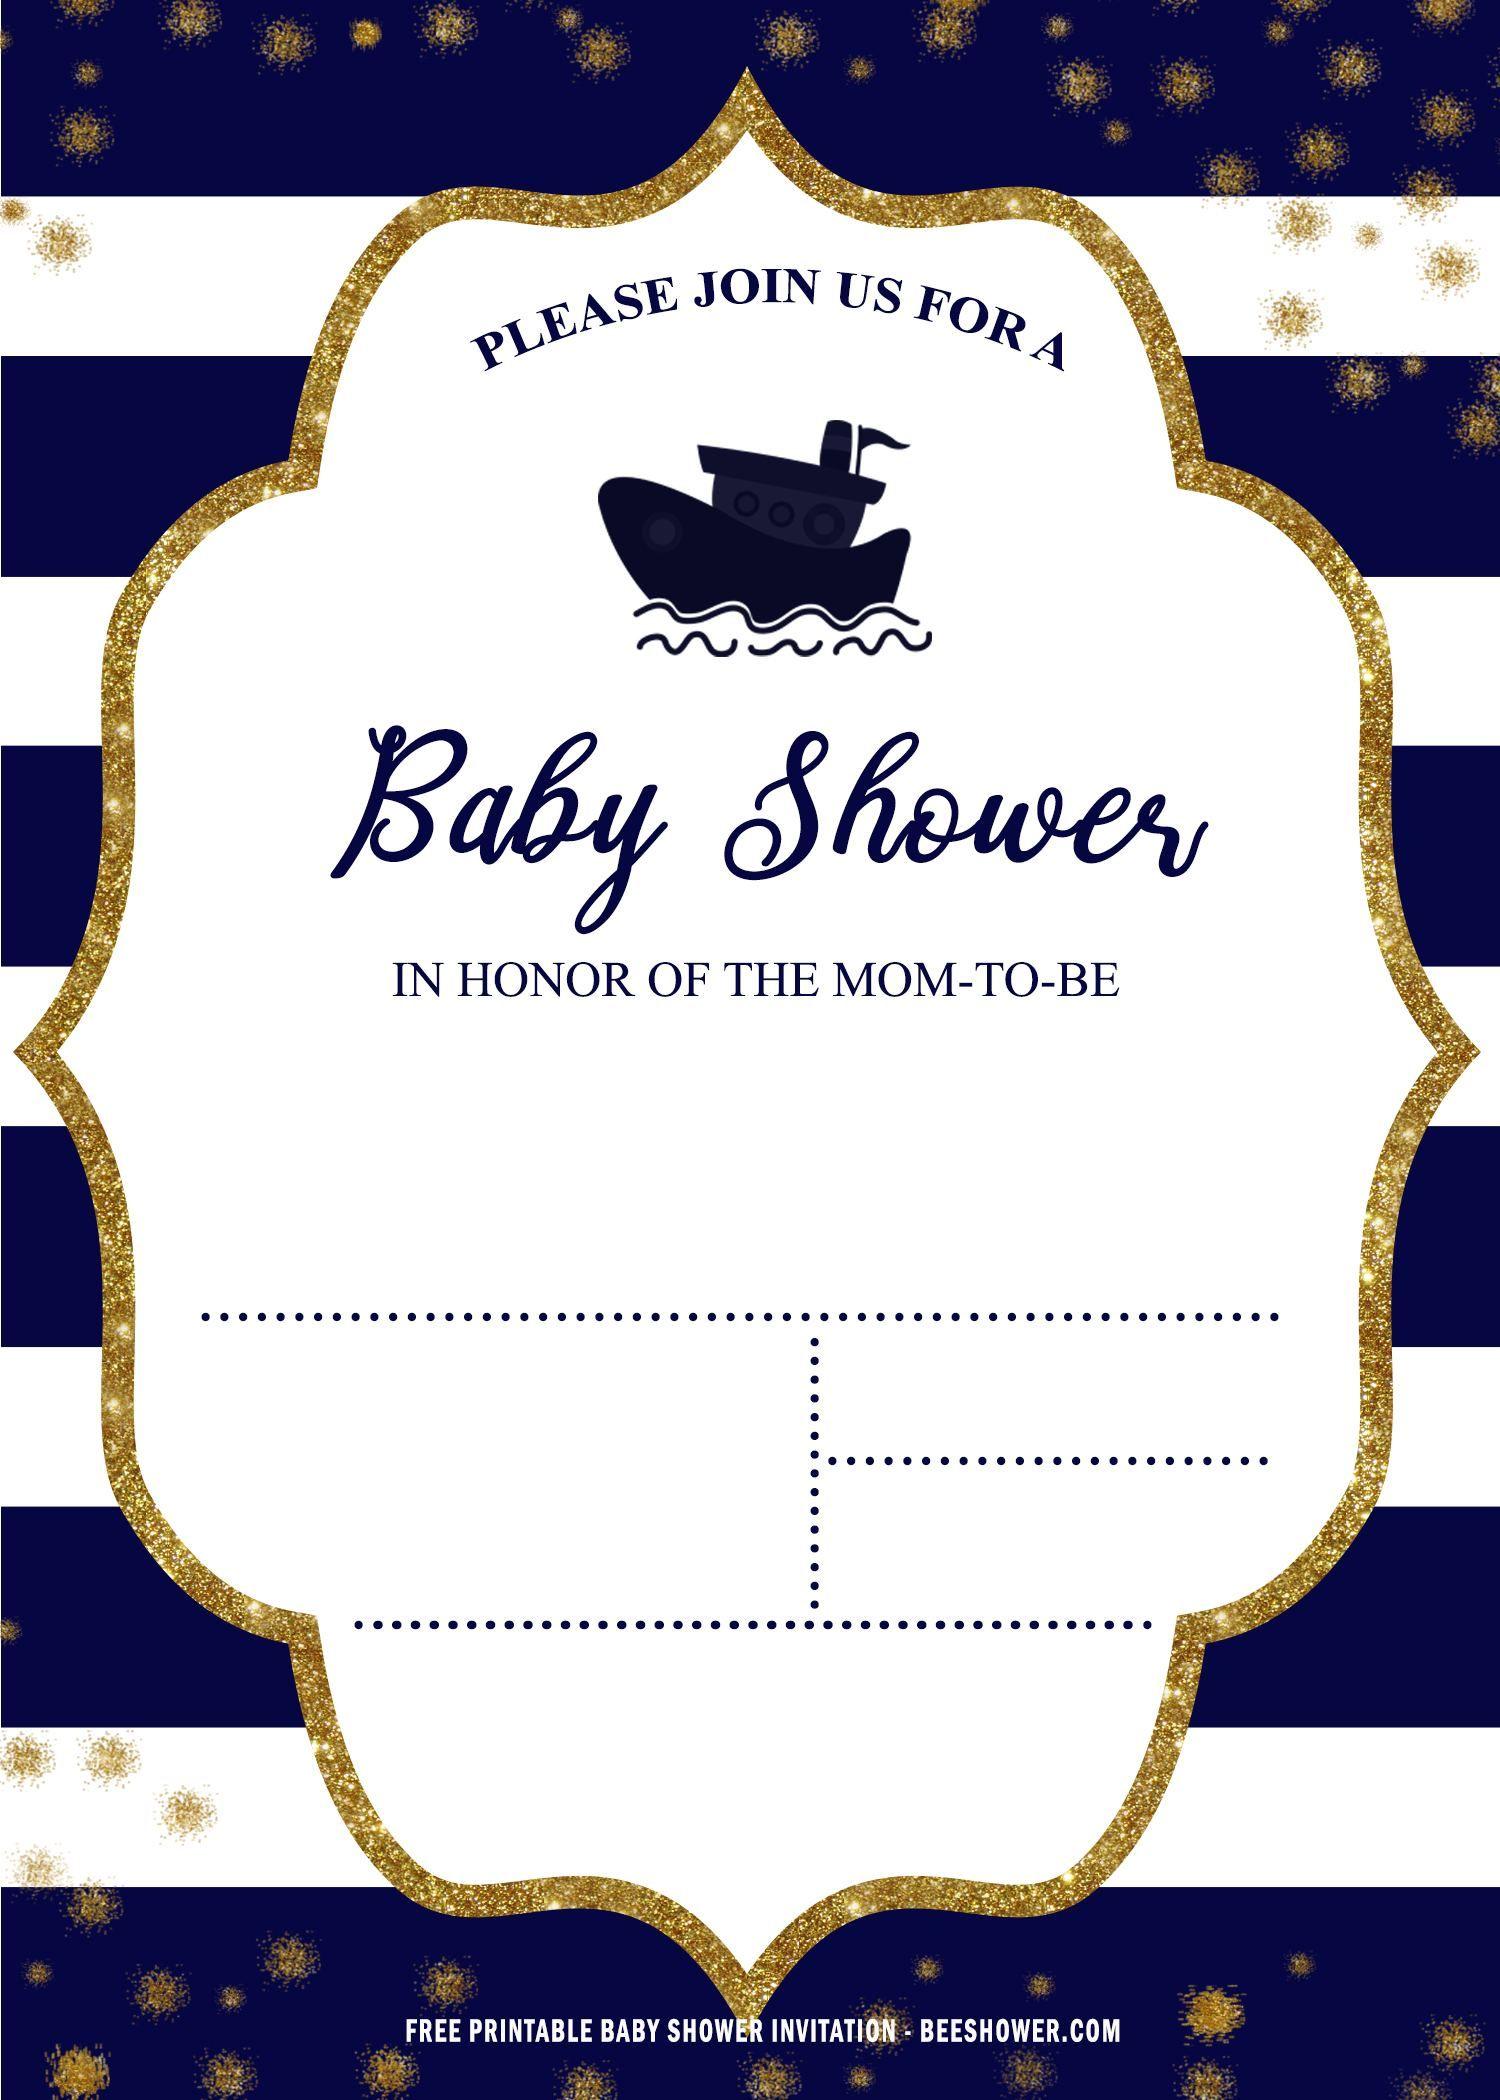 Free Printable Nautical Baby Shower Invitation Templates Nautical Baby Shower Invitations Printable Baby Shower Invitations Free Printable Baby Shower Invitations